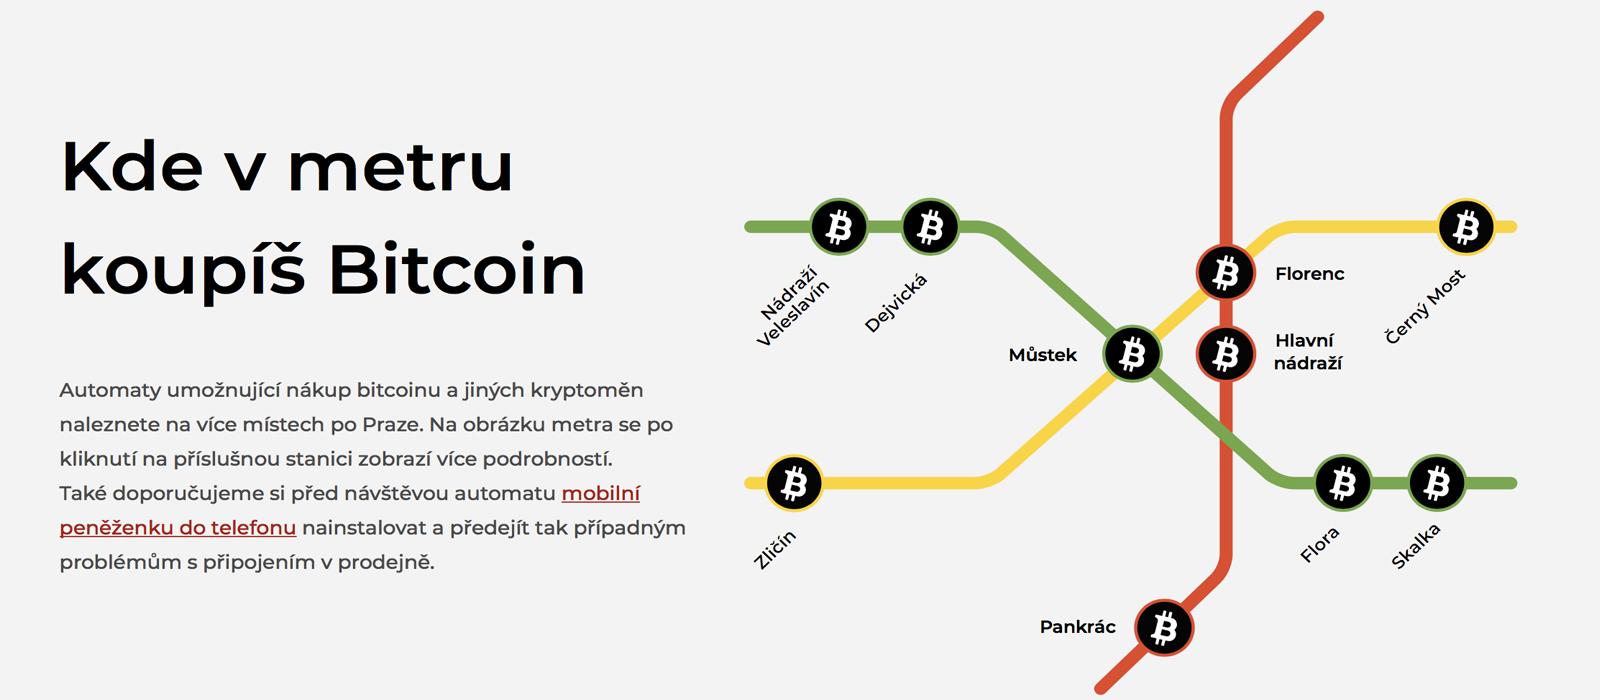 Prague Subway System Now Has Ten New Bitcoin ATMs